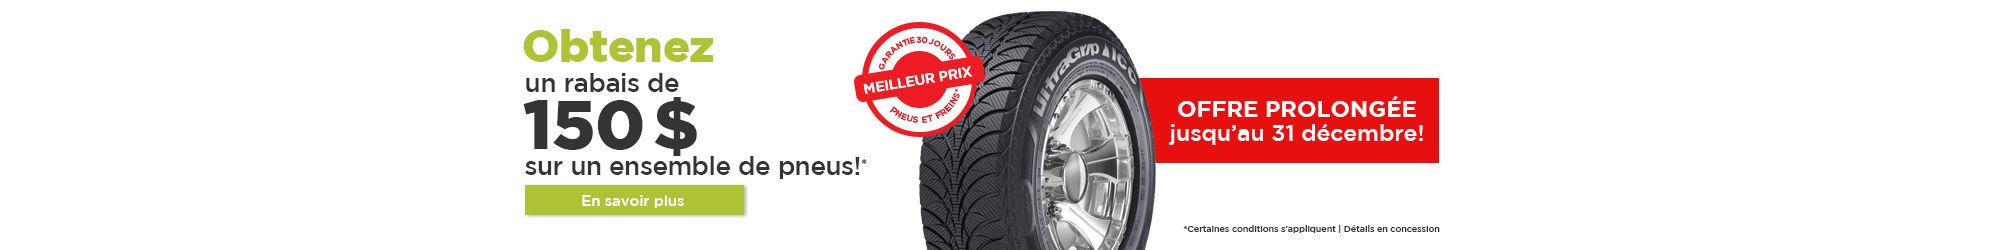 Rabais de 150$ sur pneus!